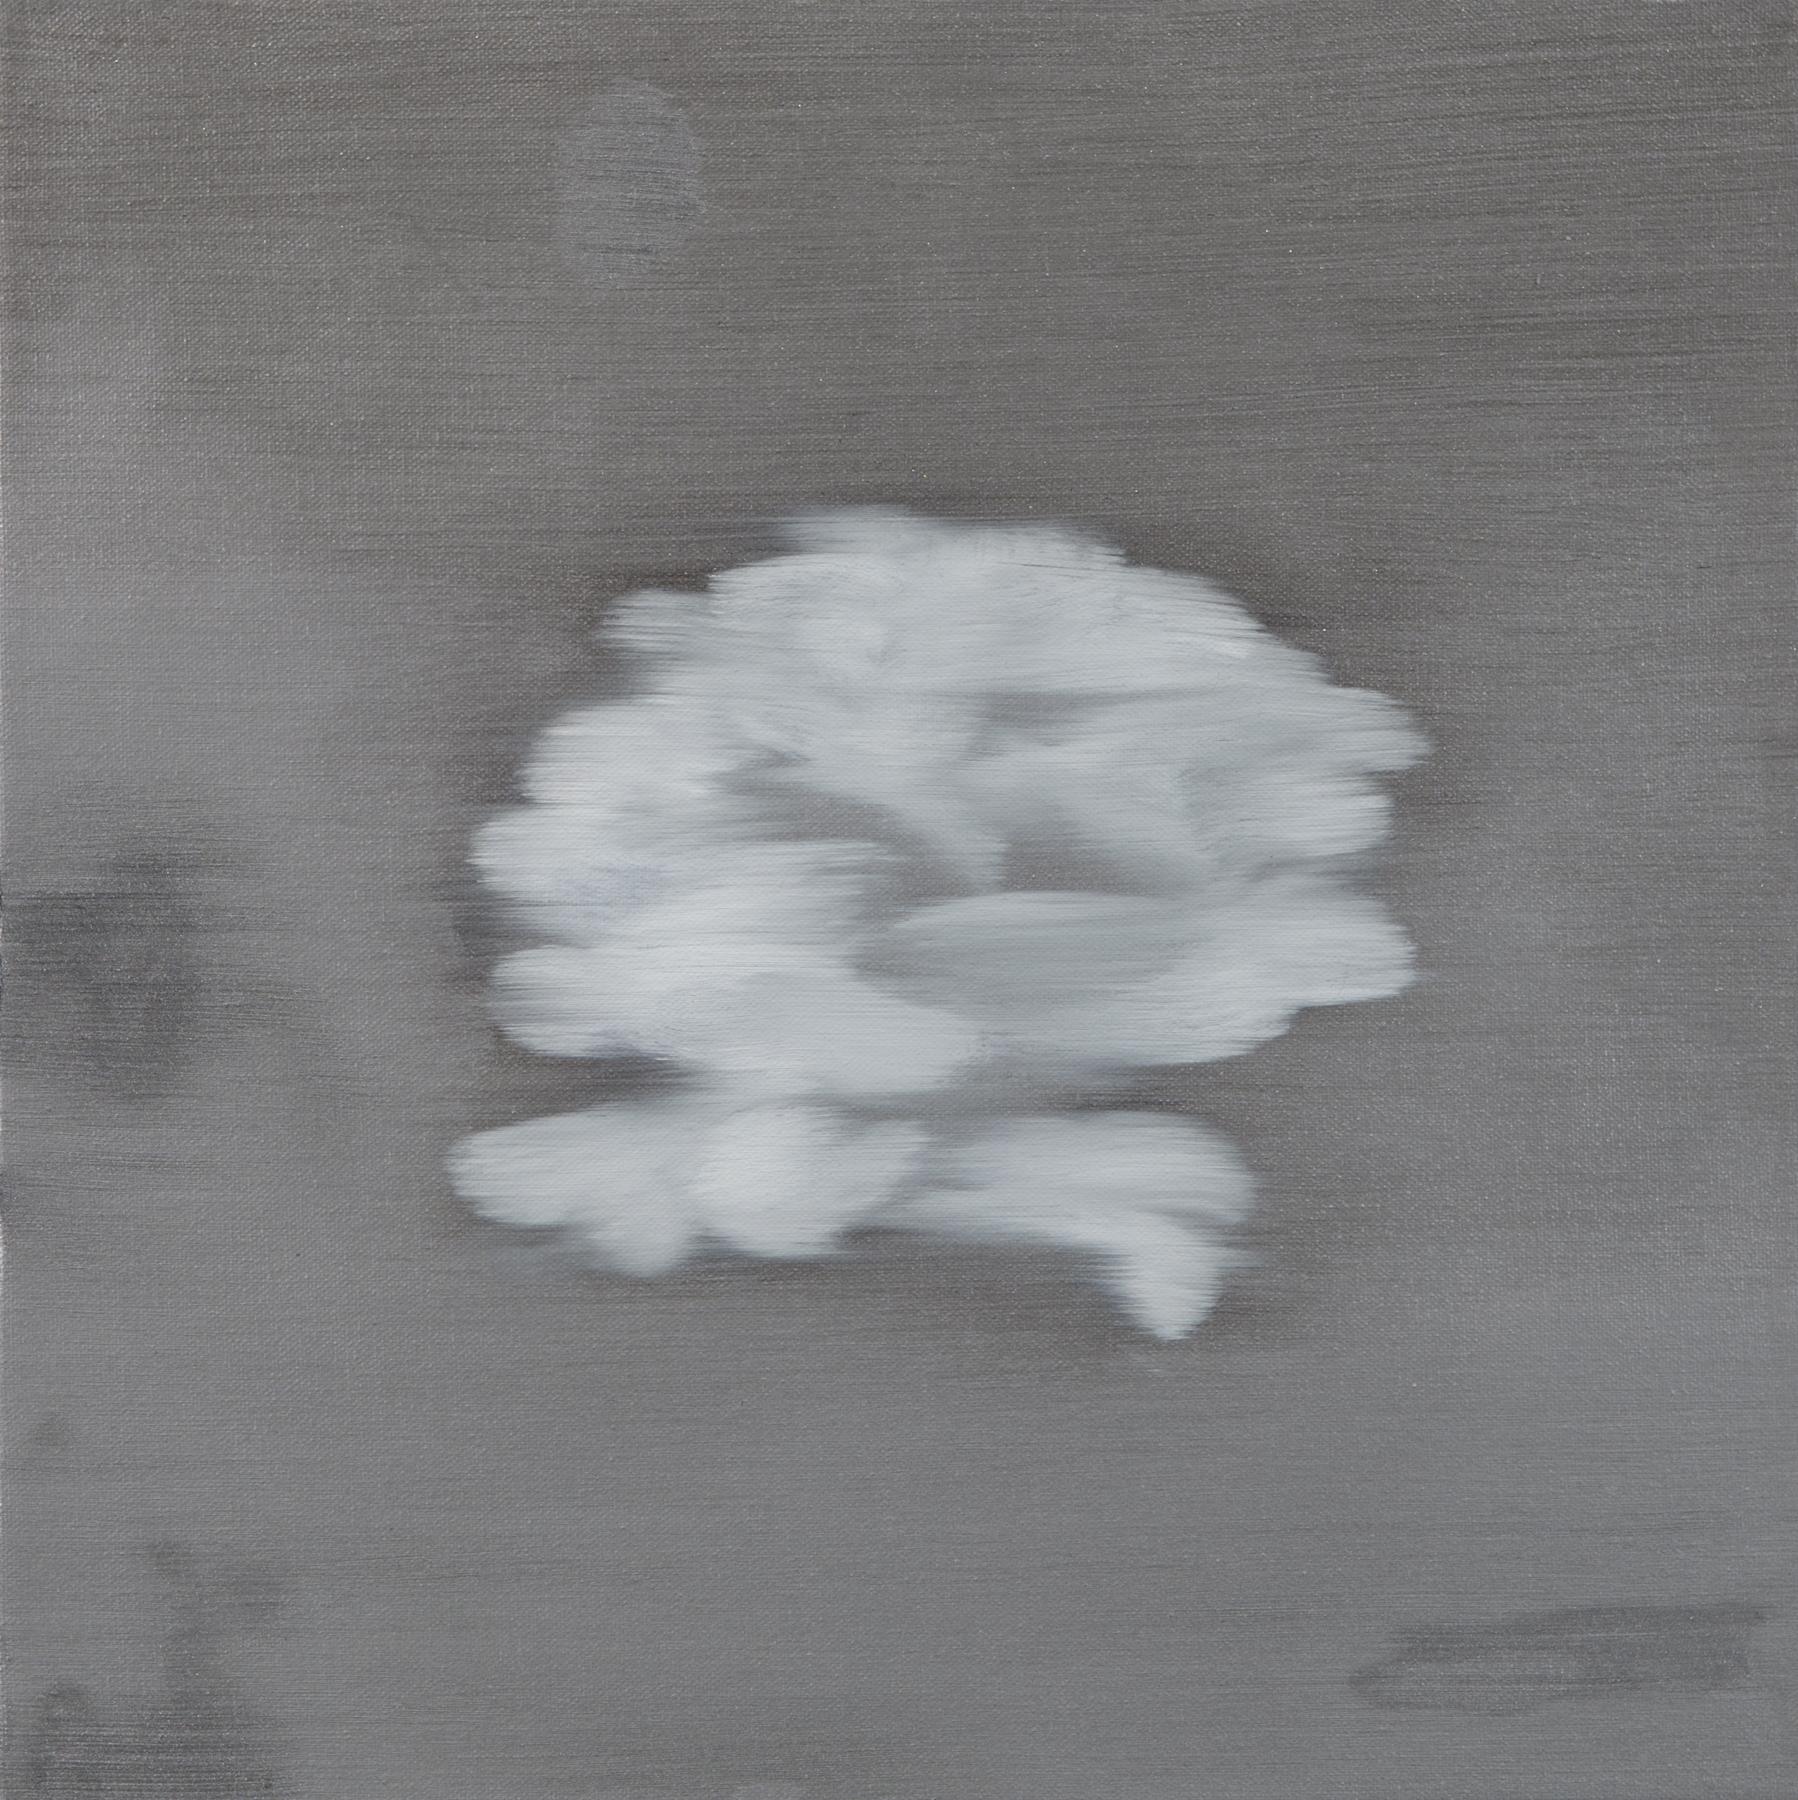 Ross Bleckner,  Untitled  2018 18 x 18 in Oil on canvas